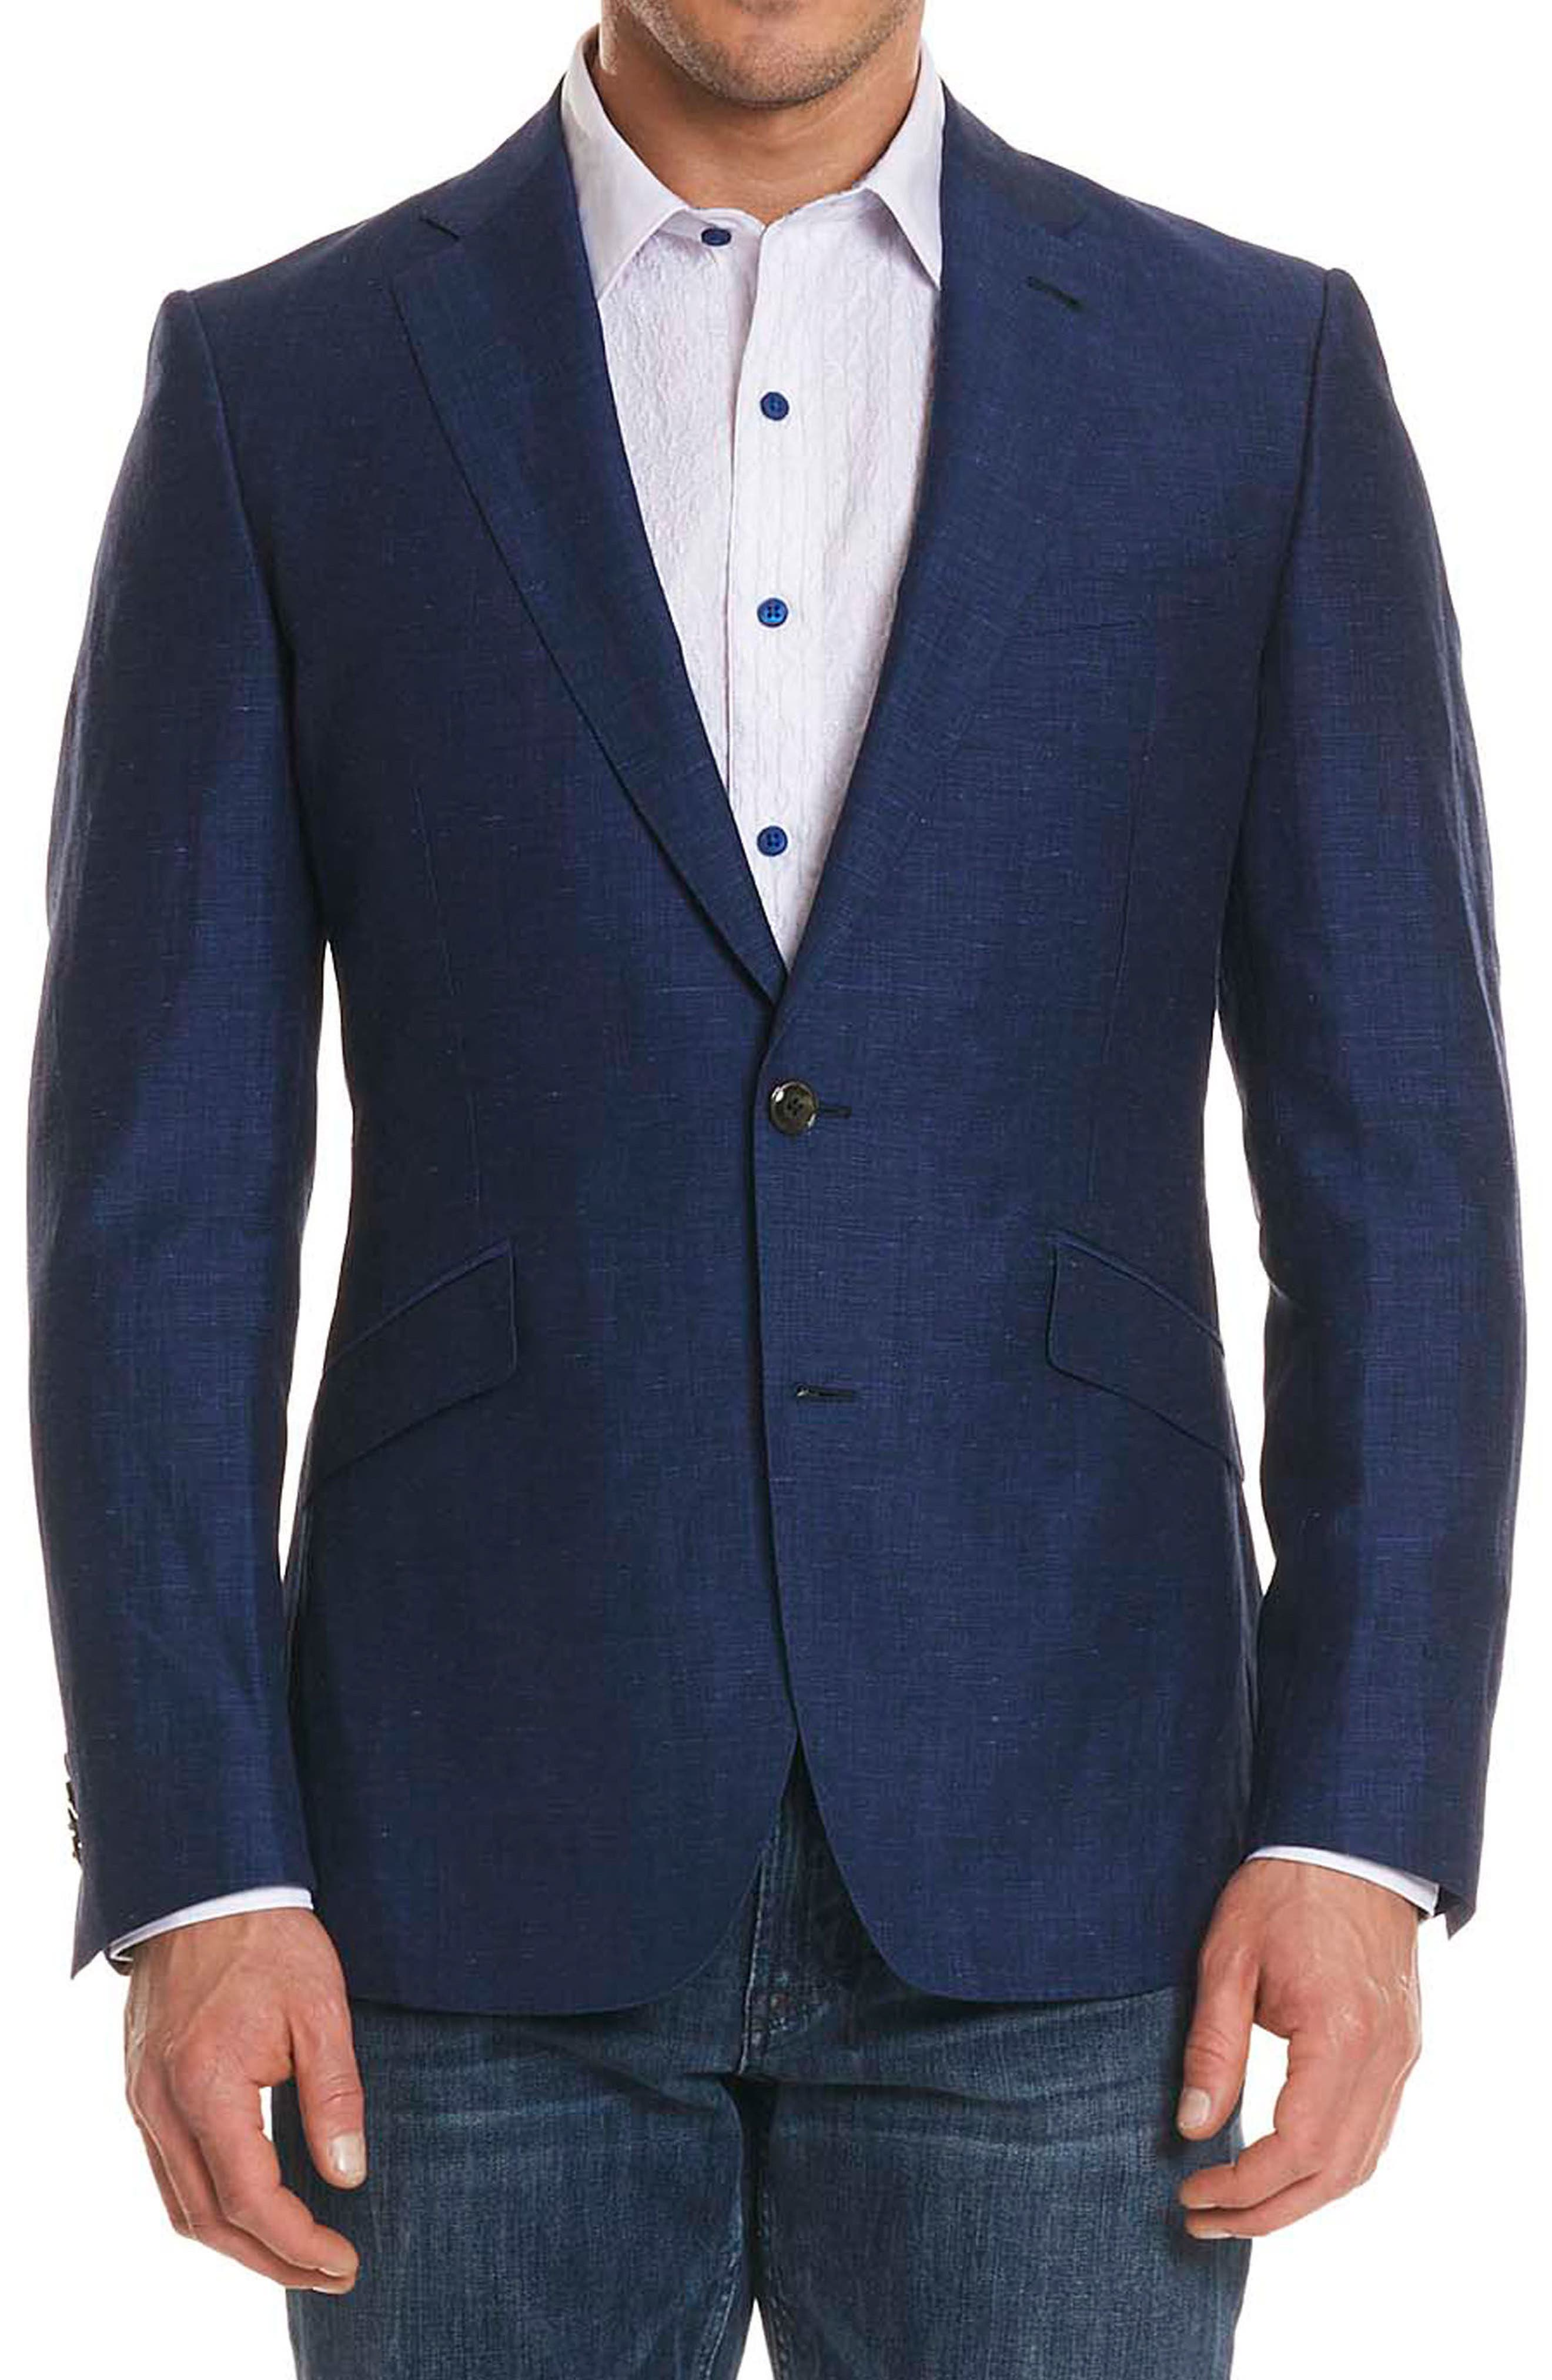 Main Image - Robert Graham Vidin Tailored Fit Linen & Wool Sportcoat